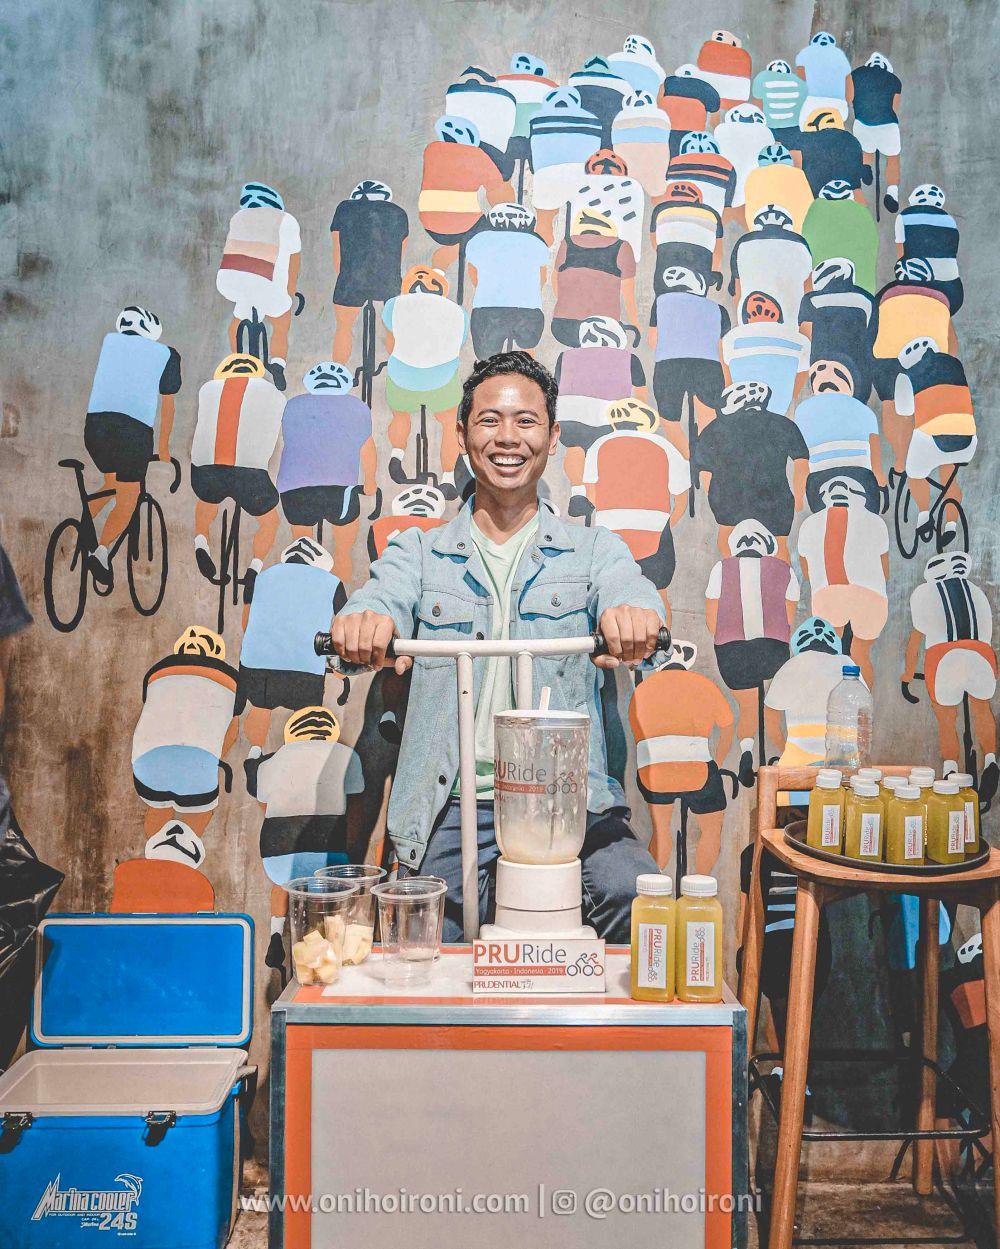 2 Pruride 2019 sport festival yogyakarta prudential indonesia oni hoironi.jpg